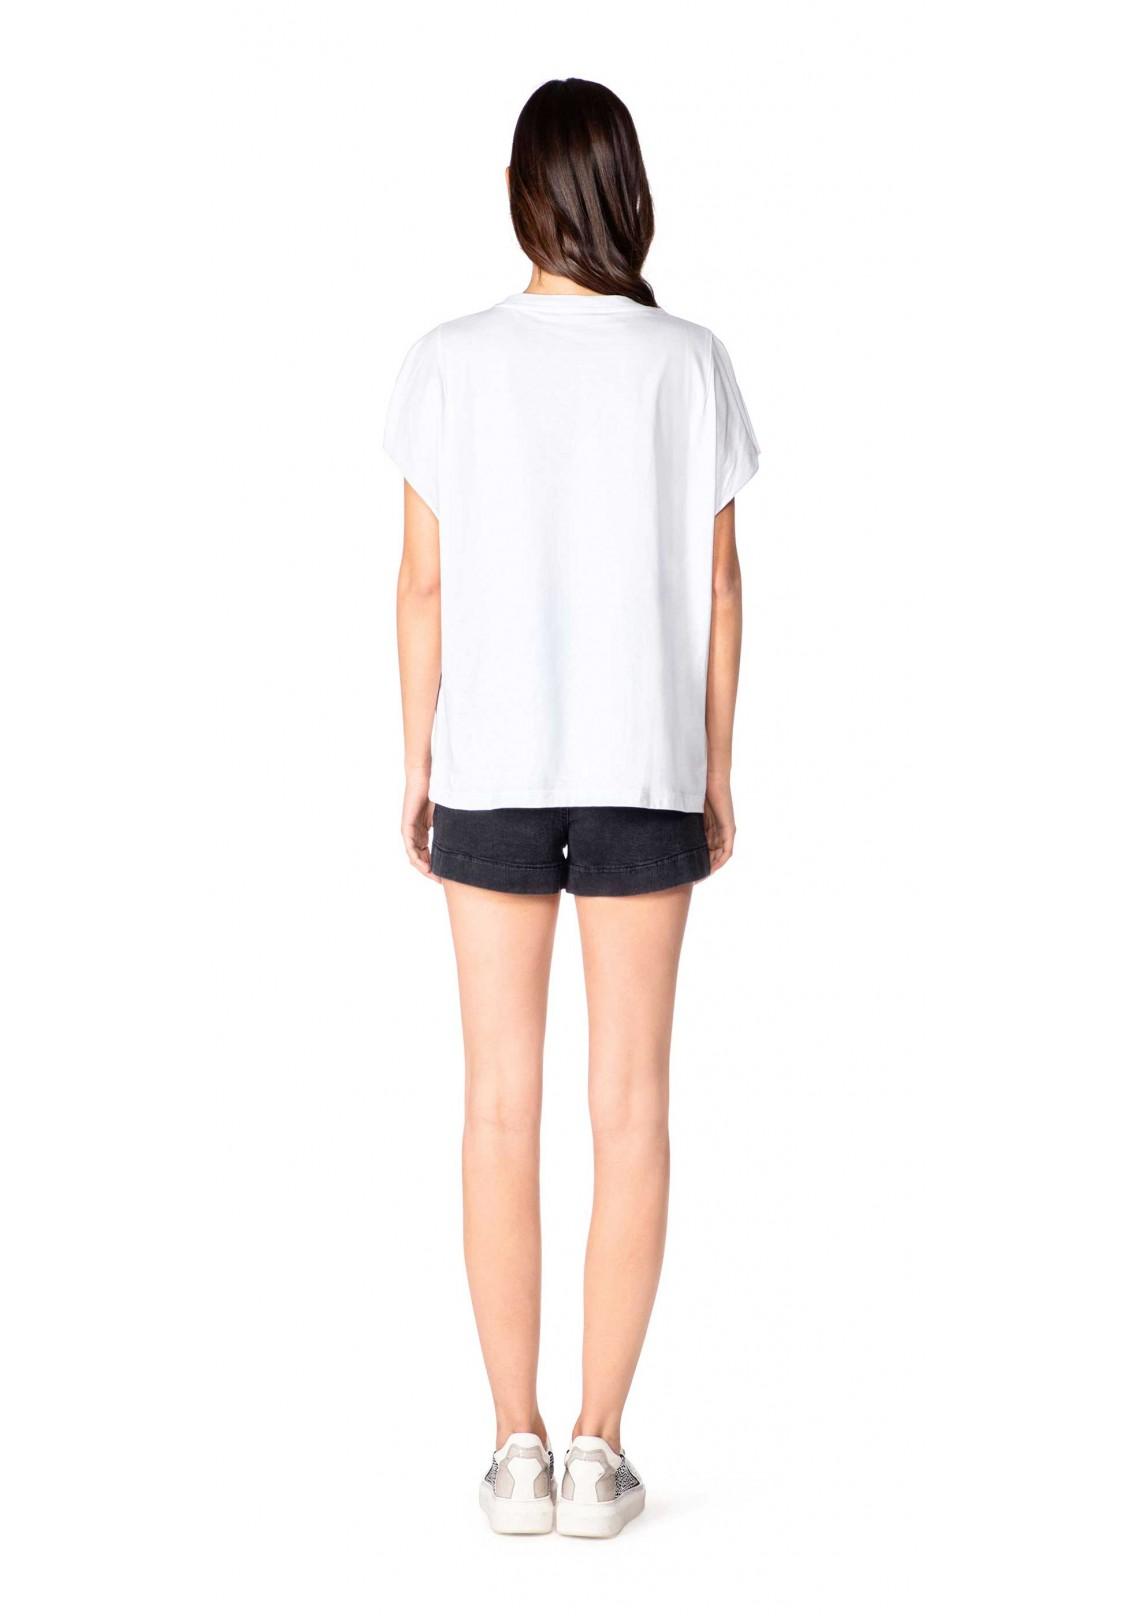 Gaelle T-shirt Donna Bianco Gaelle | GBD8823BIANCO